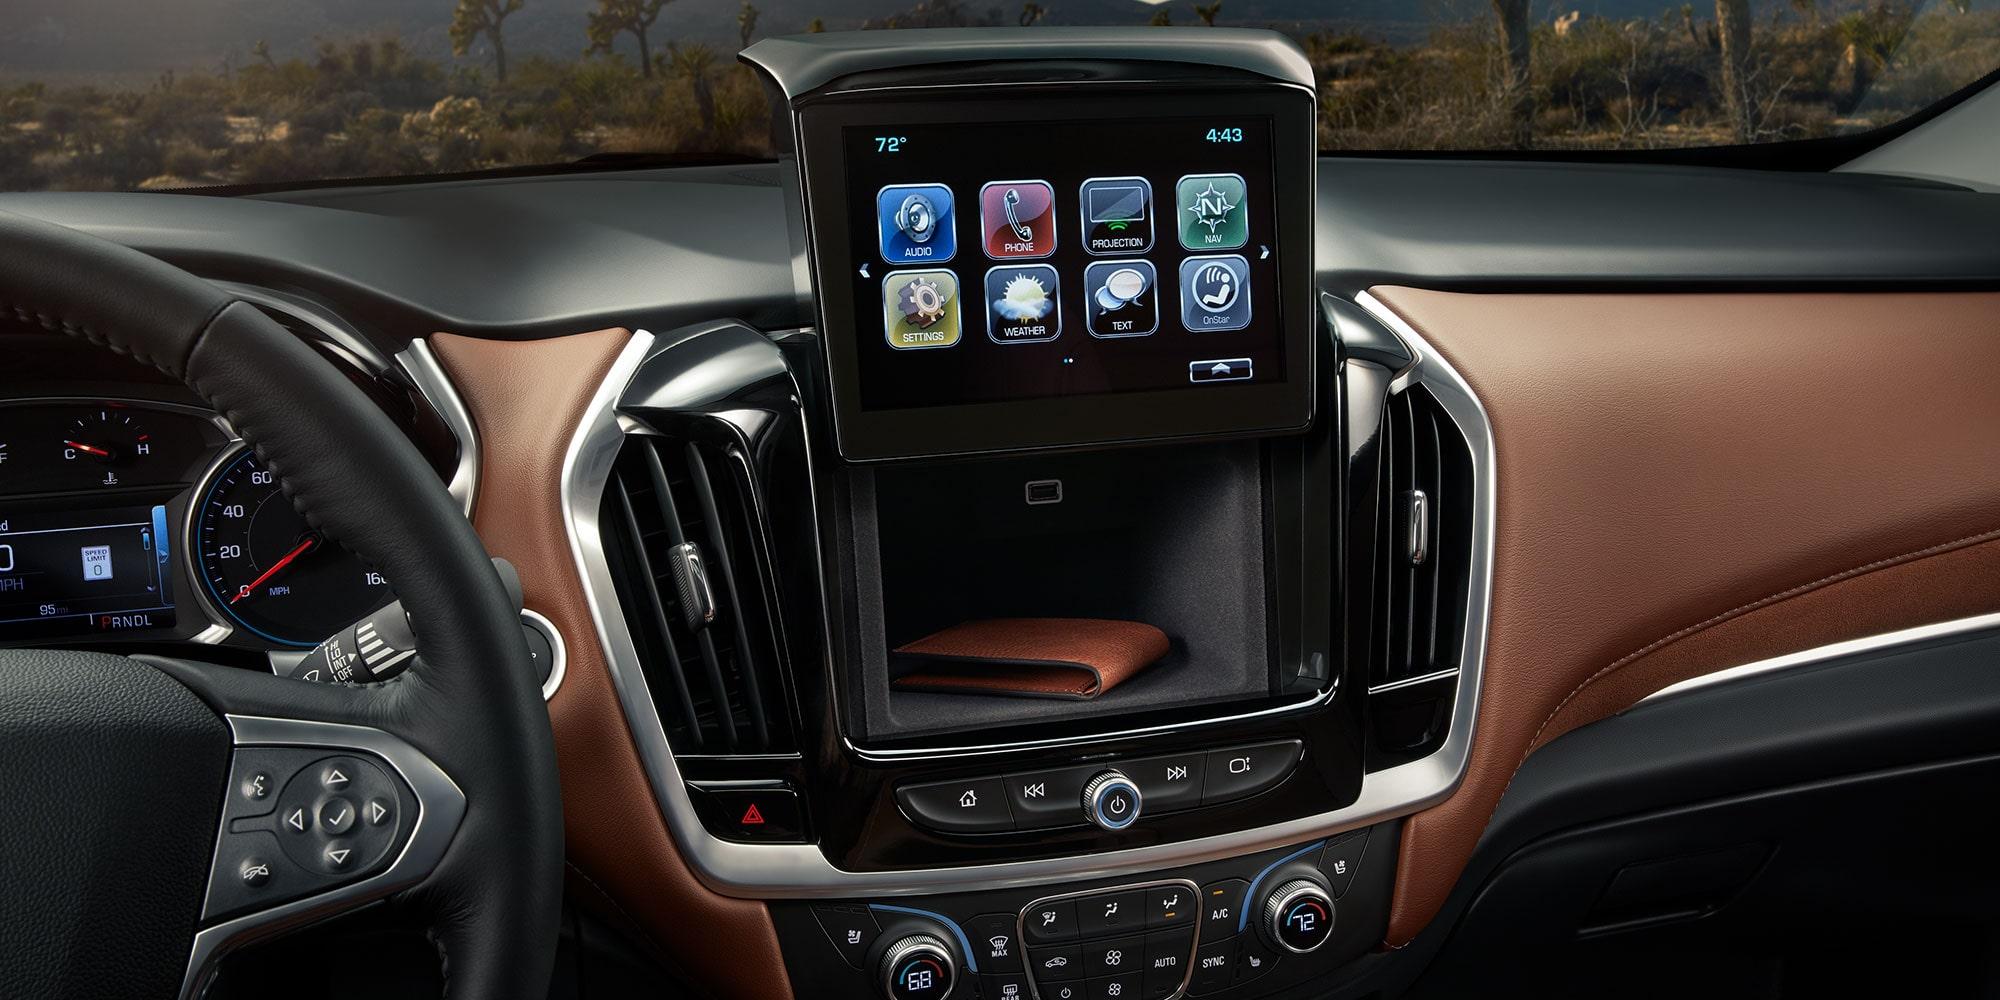 2019 Traverse Midsize SUV Interior Photo: Hidden Storage Amazing Design